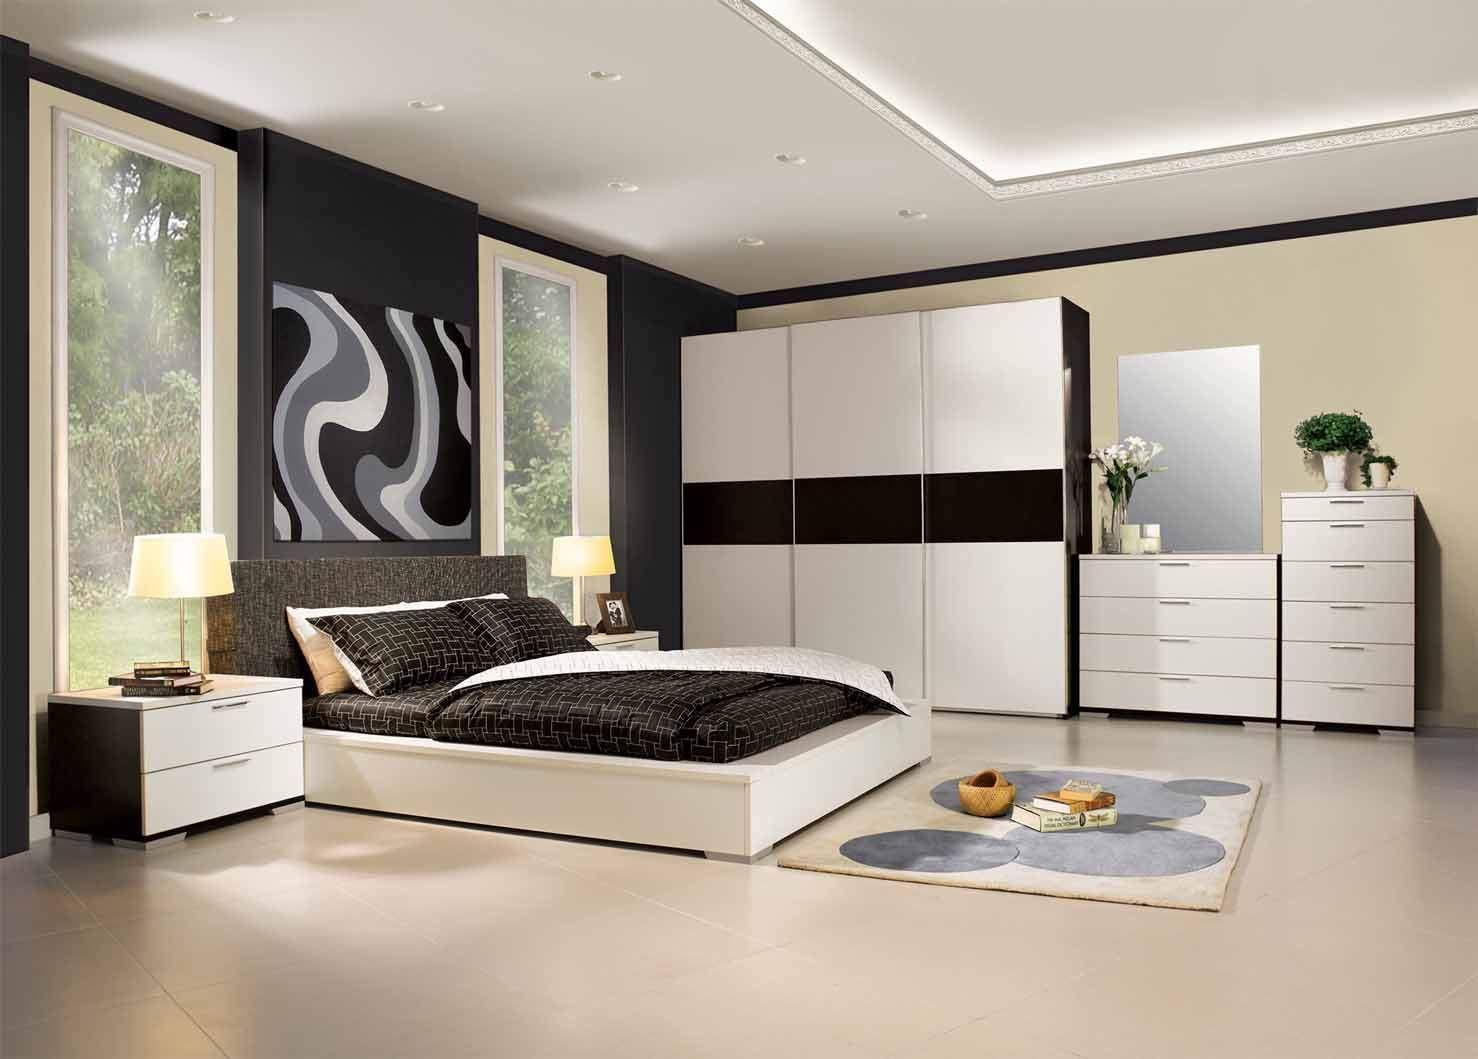 Kinderzimmer decke design free interior design ideas for home decor badezimmer büromöbel